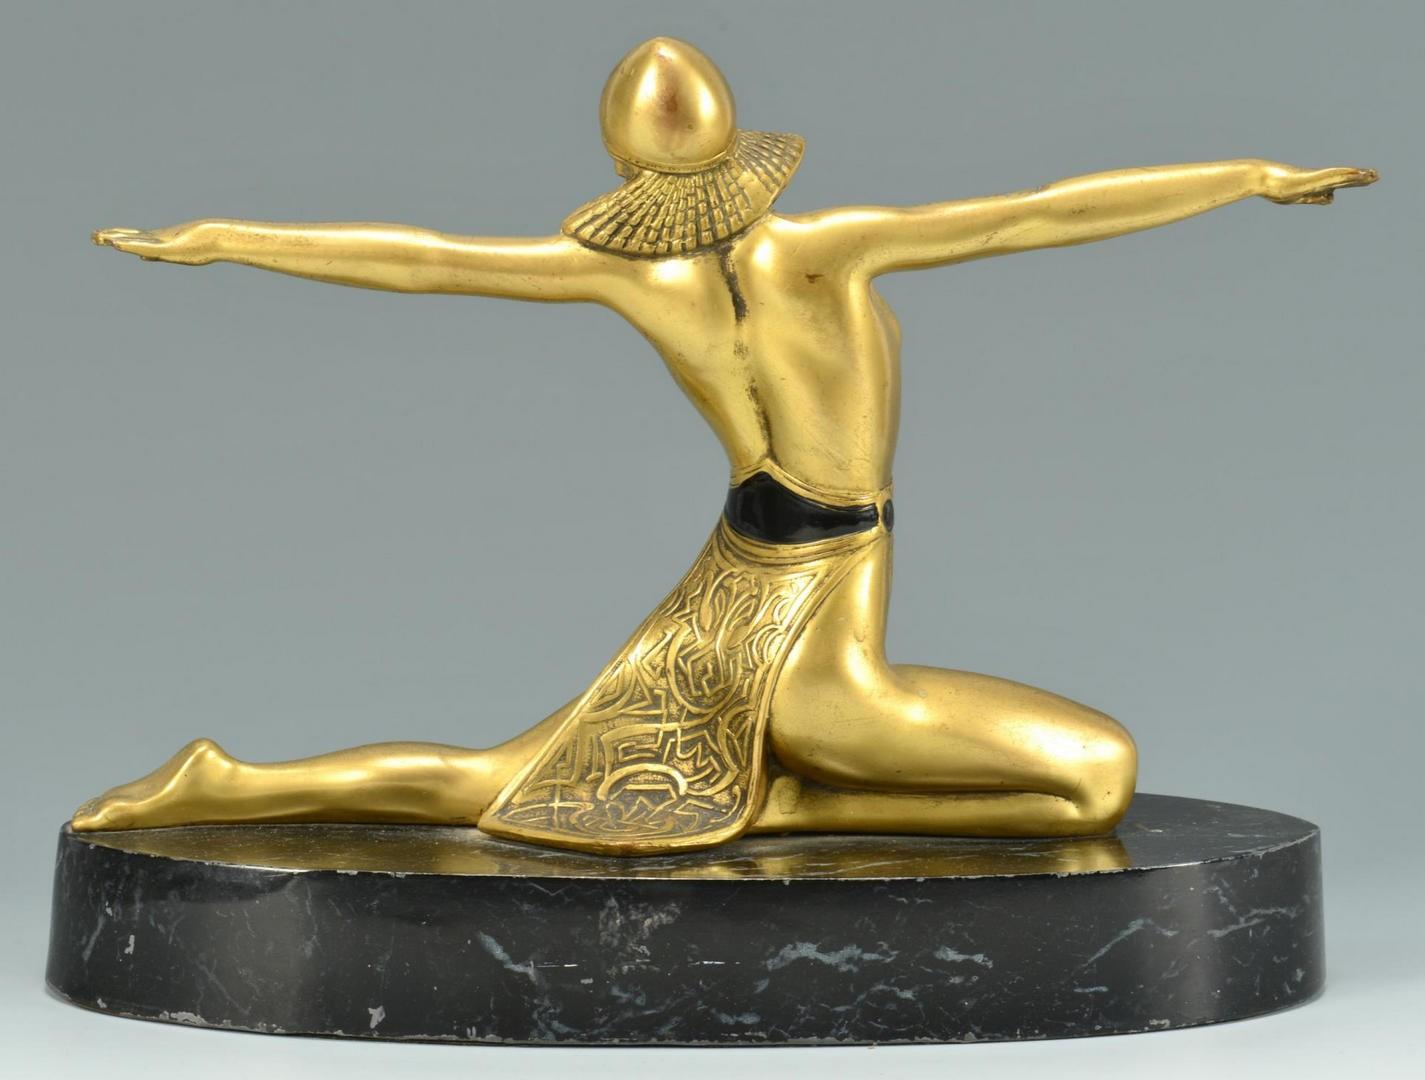 Lot 3594269: 4 Art Deco Nude Sculptures